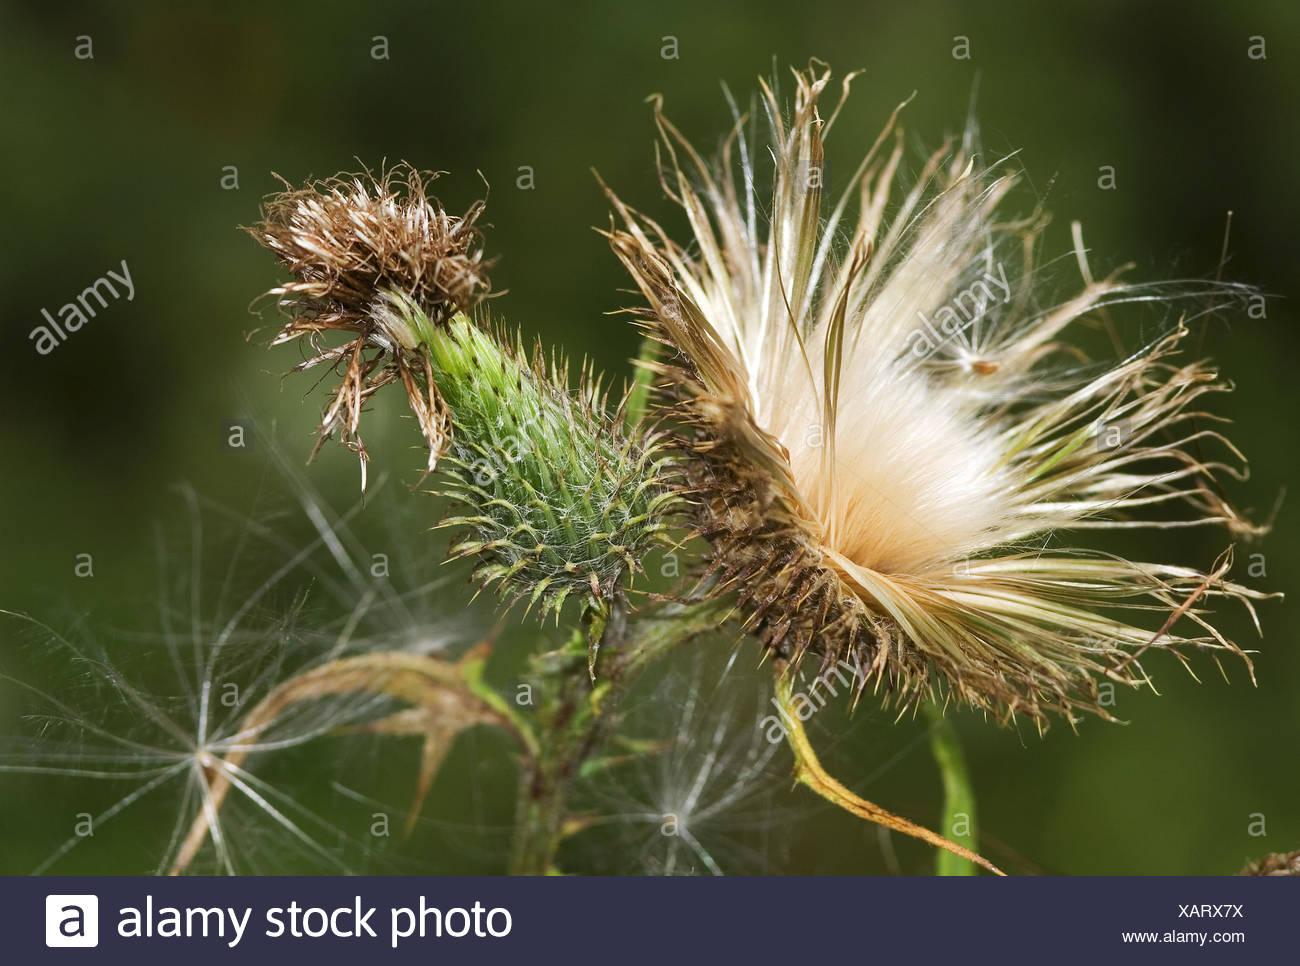 Spear Thistle / Cirsium vulgare - Stock Image